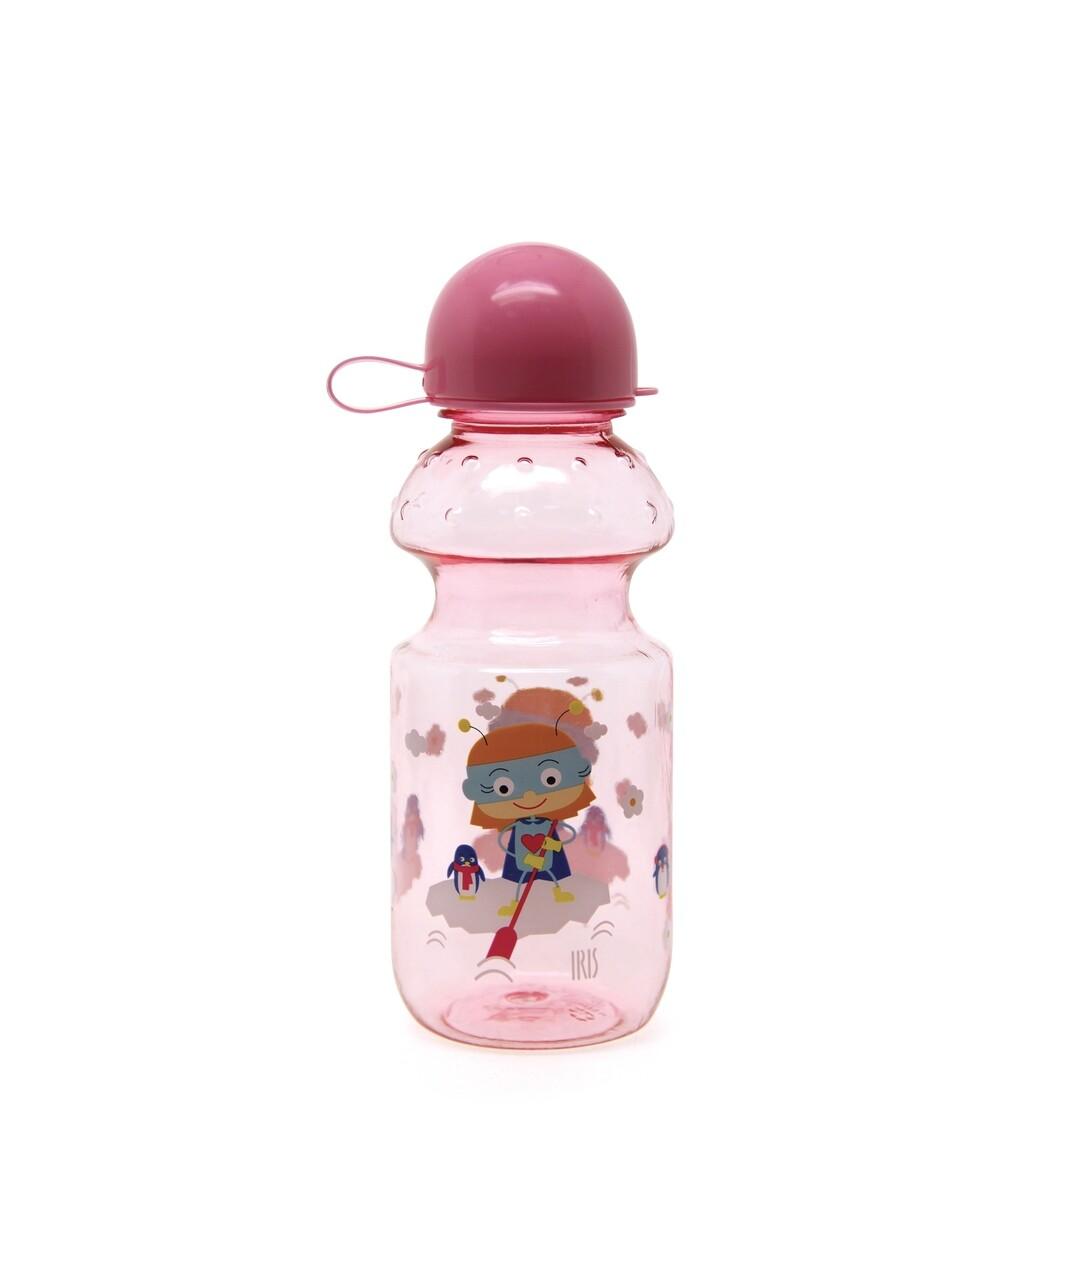 Sticla apa pentru copii, SnackRico Girl, Iris Barcelona, 350 ml,Tritan, roz